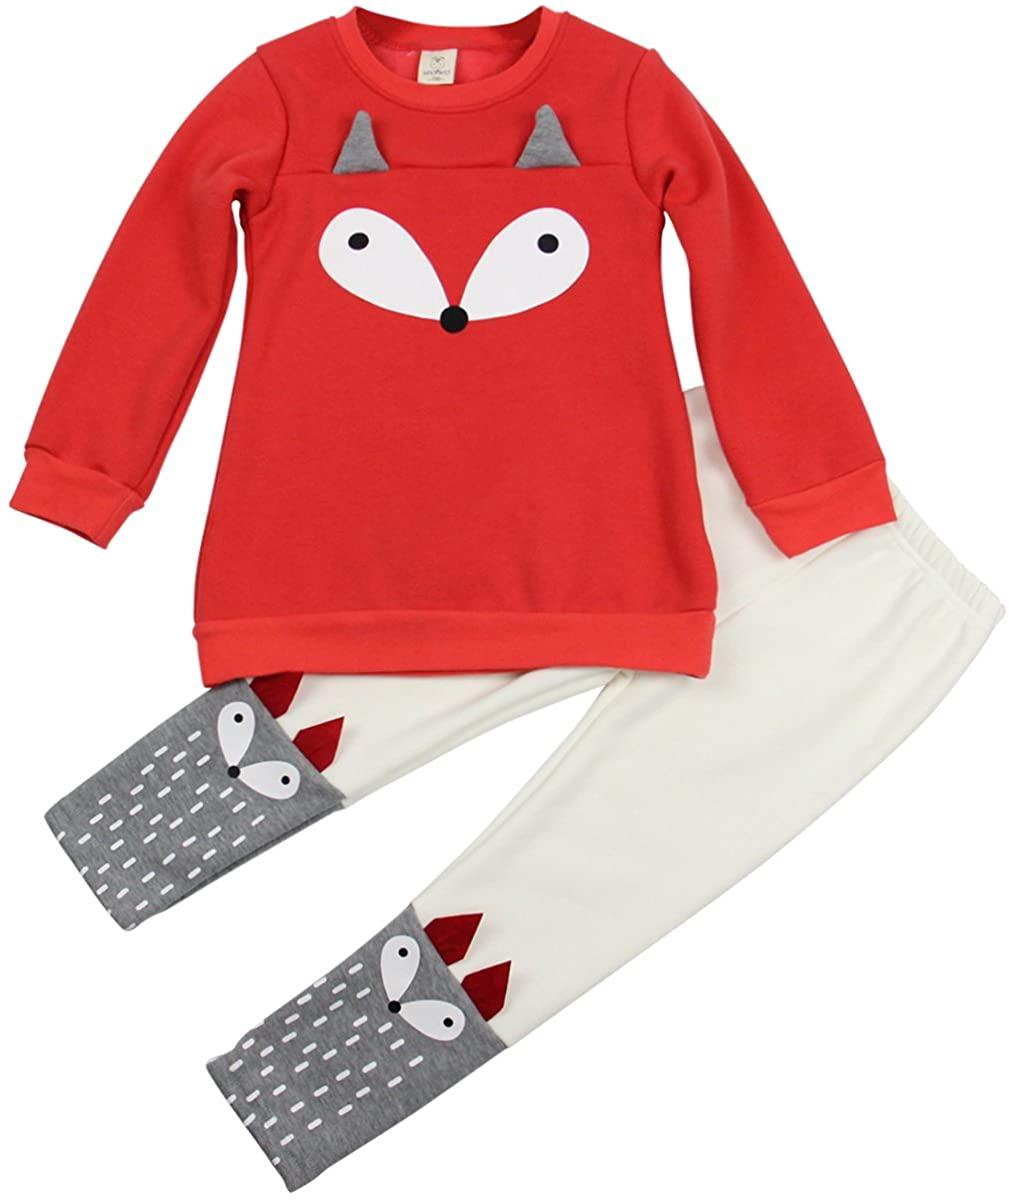 Jastore Baby Girl 2PCS Cartoon Fox Clothing Set Long Sleeve Sweater +Pants